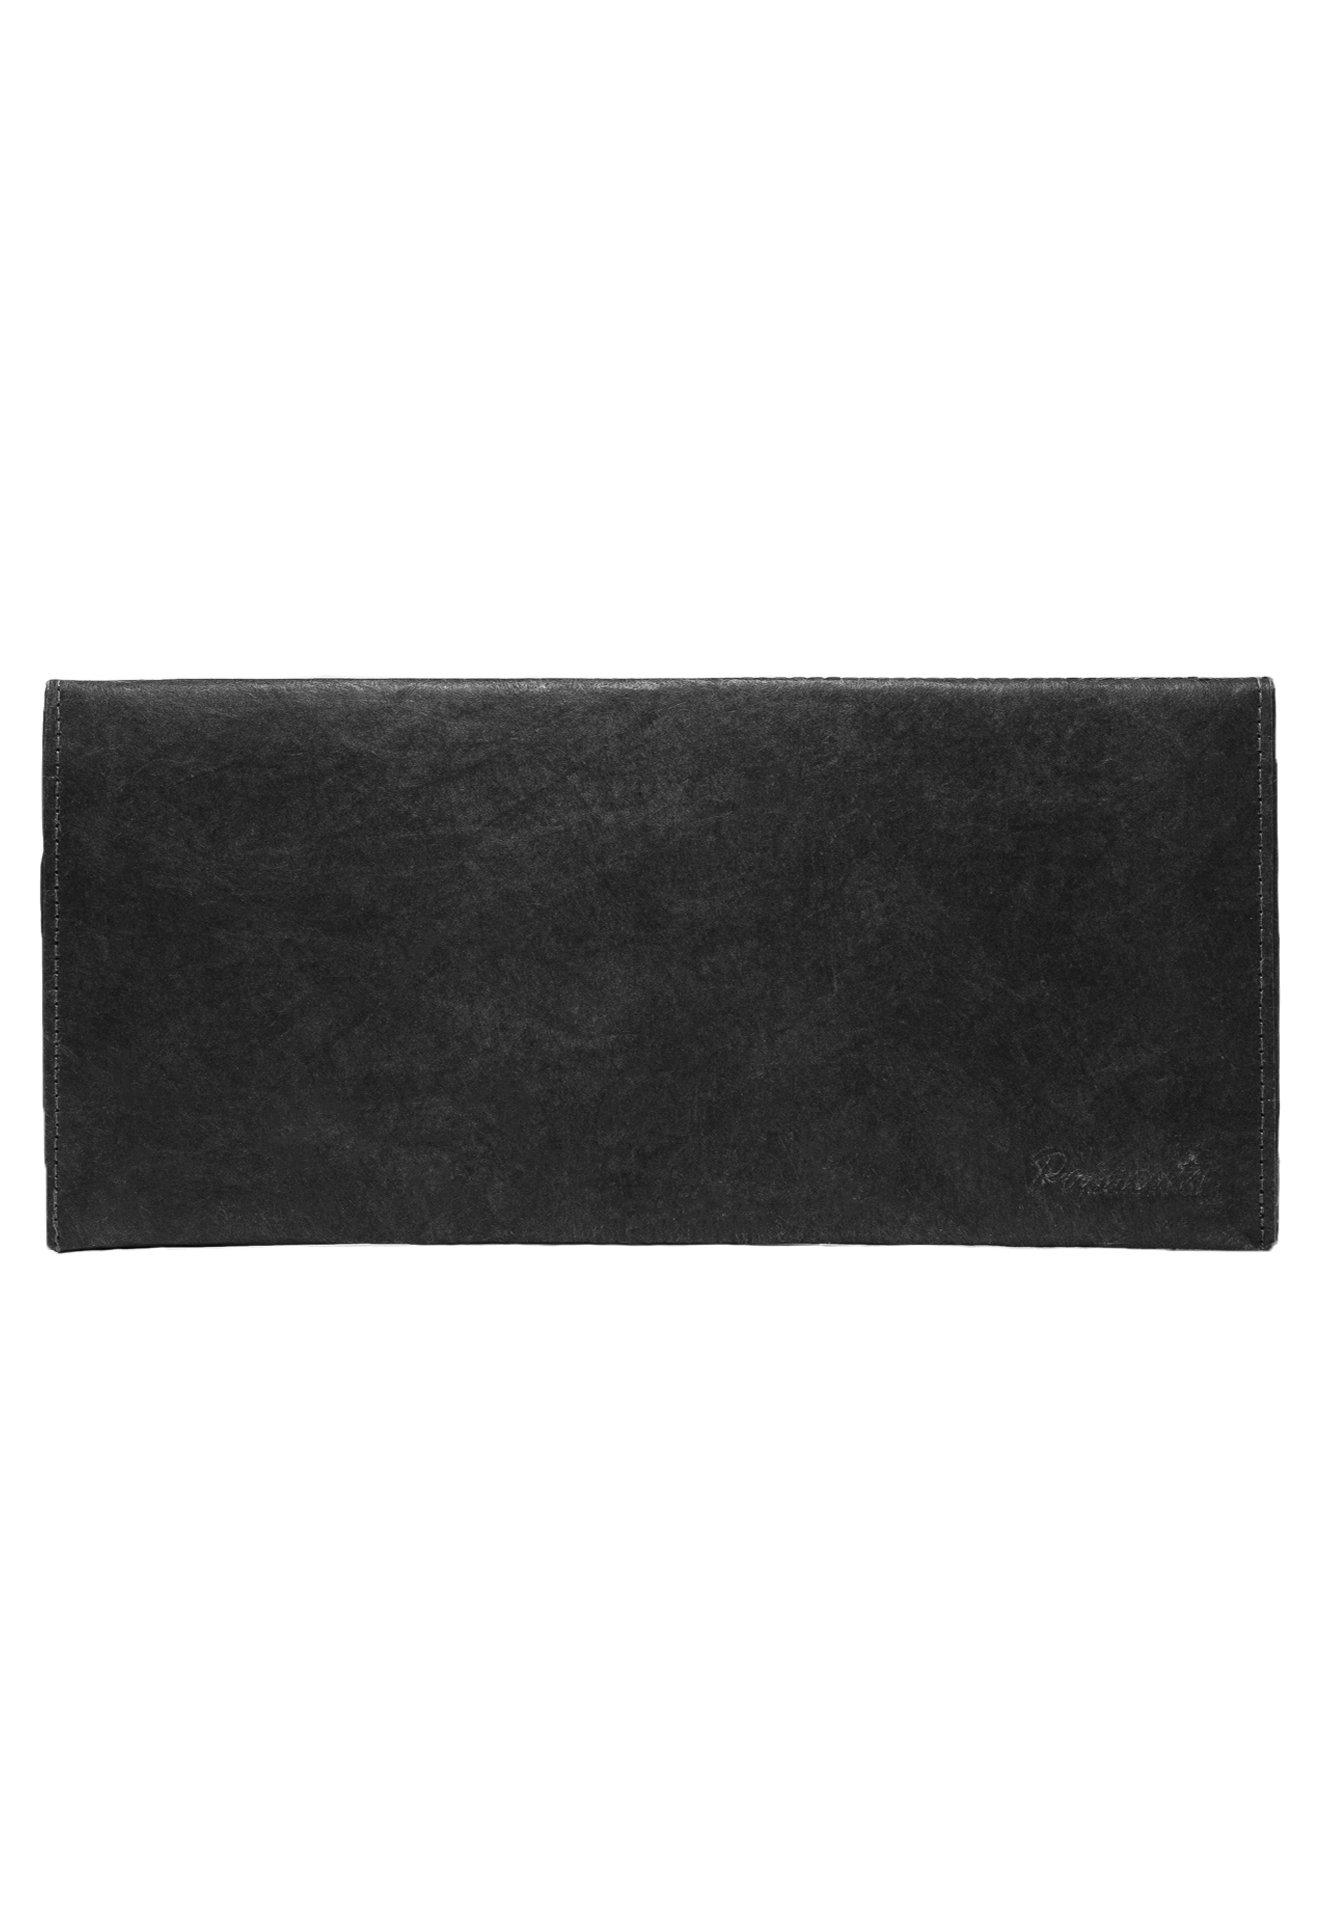 Homme JUST BLACK - SILVER XL - Portefeuille